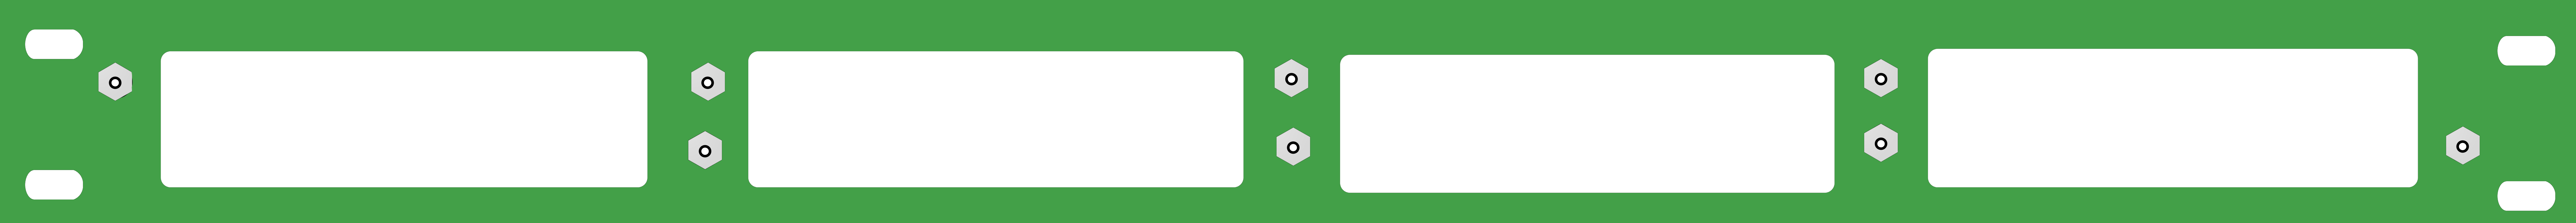 New-1U 4 Slot Rack Mount Plate-Blank